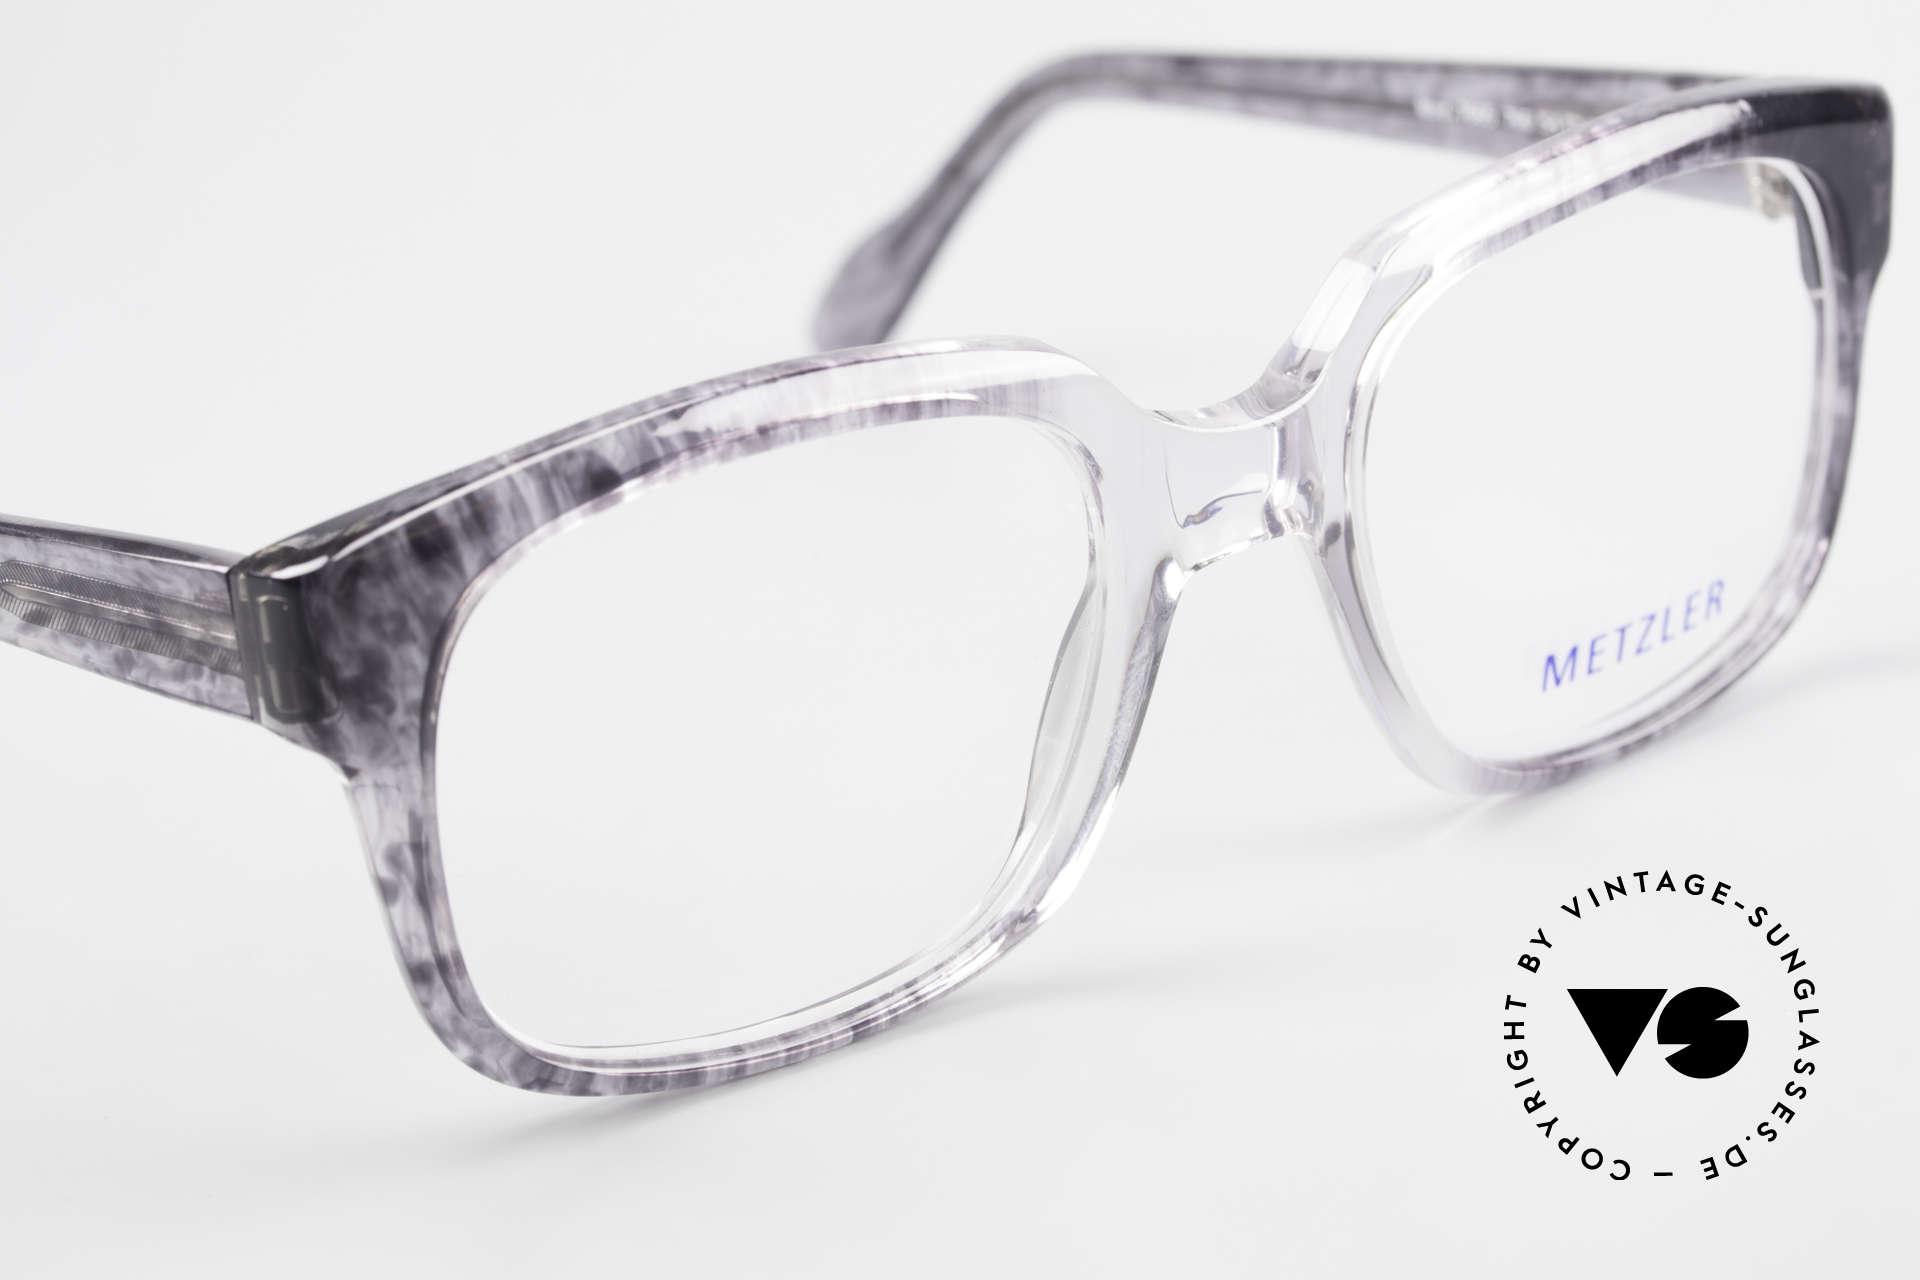 Metzler 7665 Medium 90's Old School Eyeglasses, NO RETRO; but an old 'Made in Germany' original, Made for Men